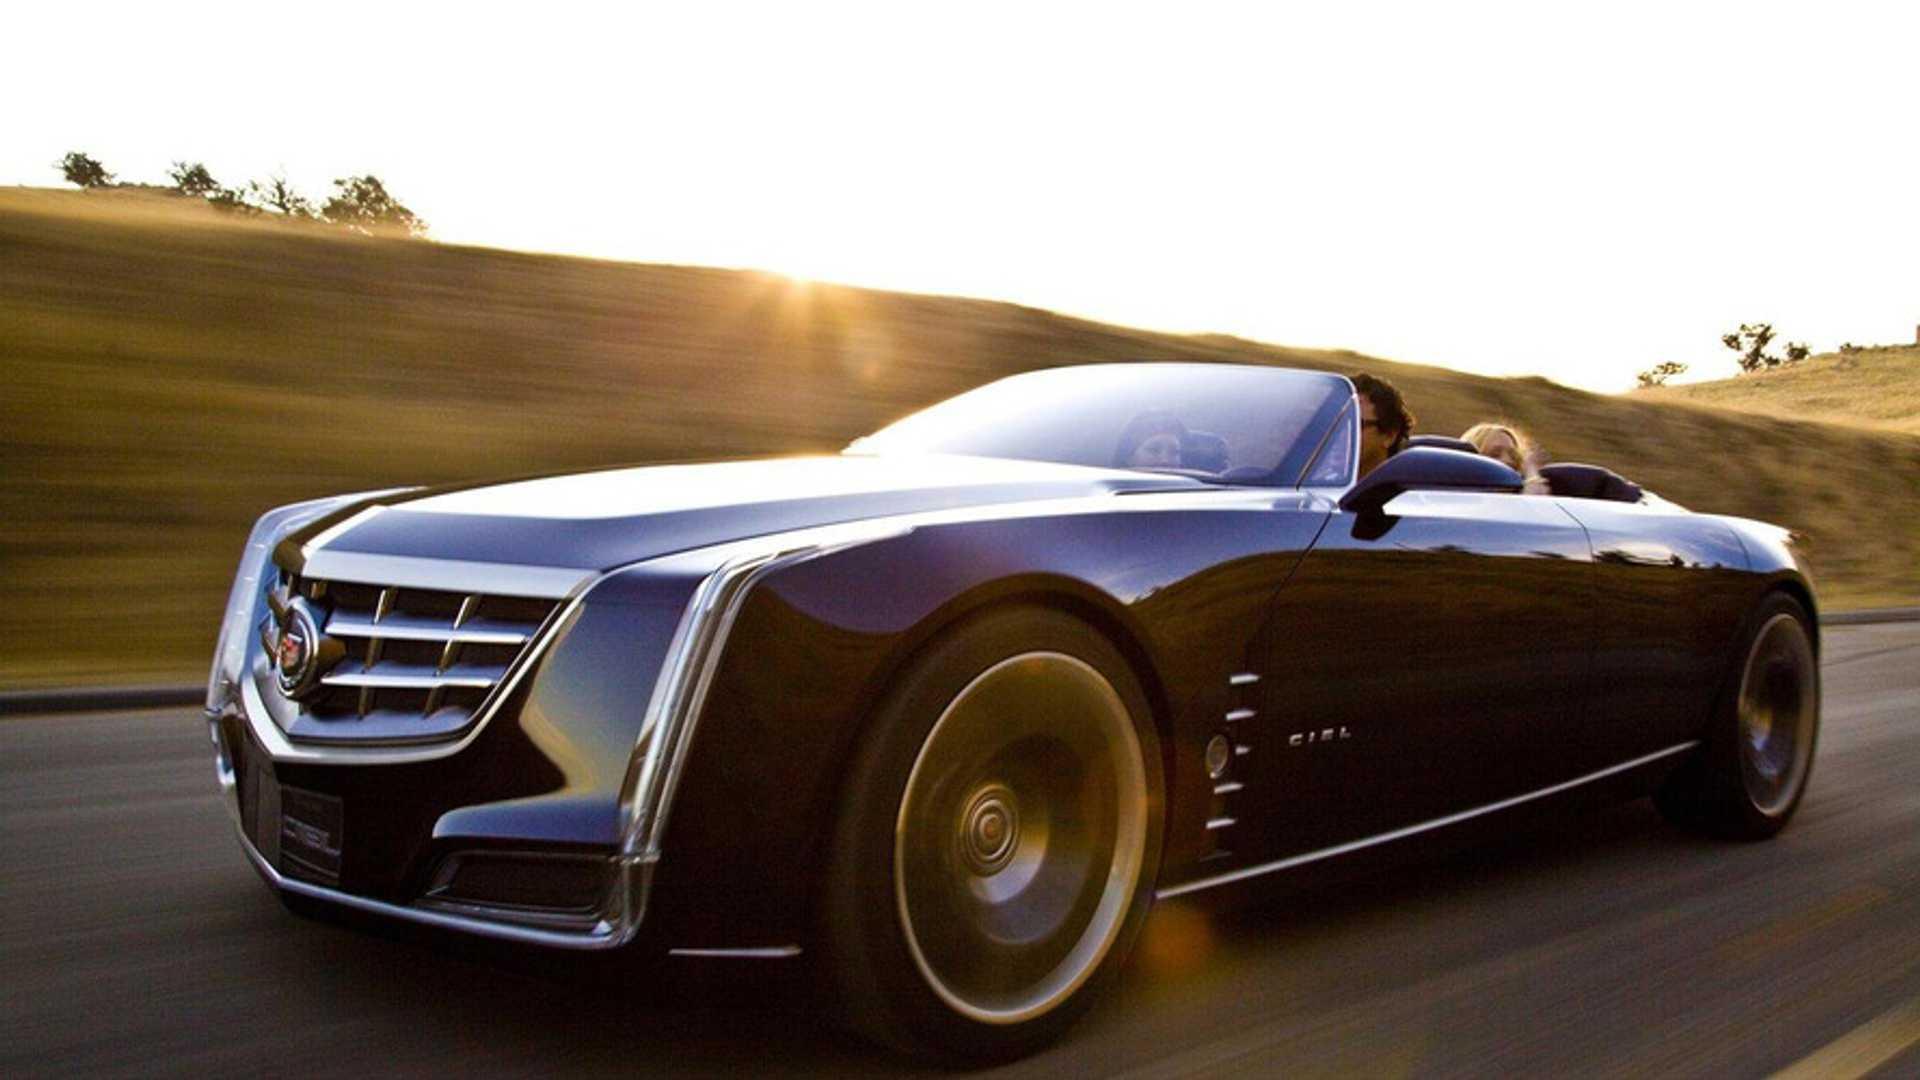 Cadillac Ciel Concept Stars In New Entourage Promo Video